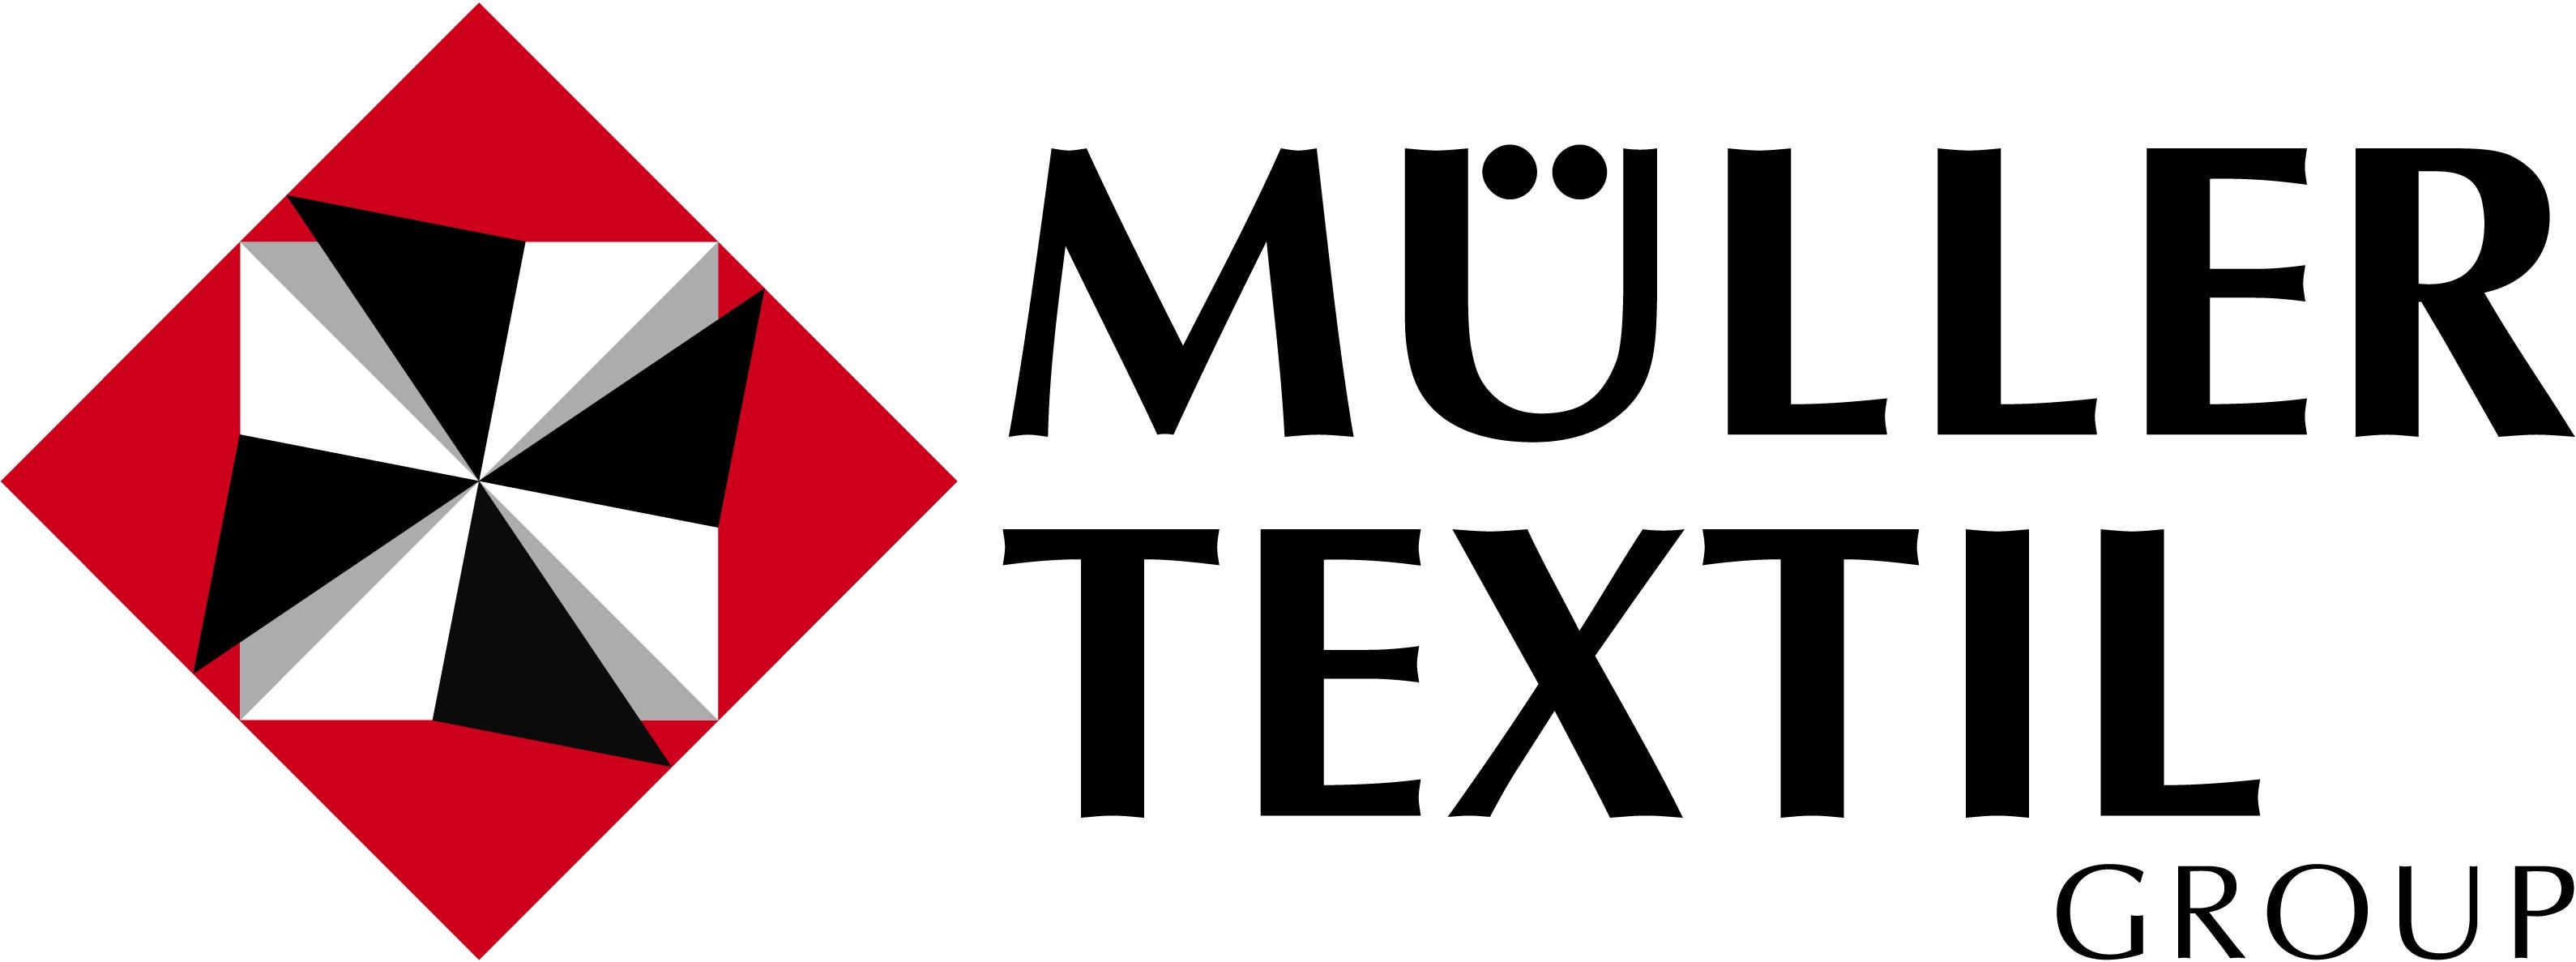 Muller Textiles